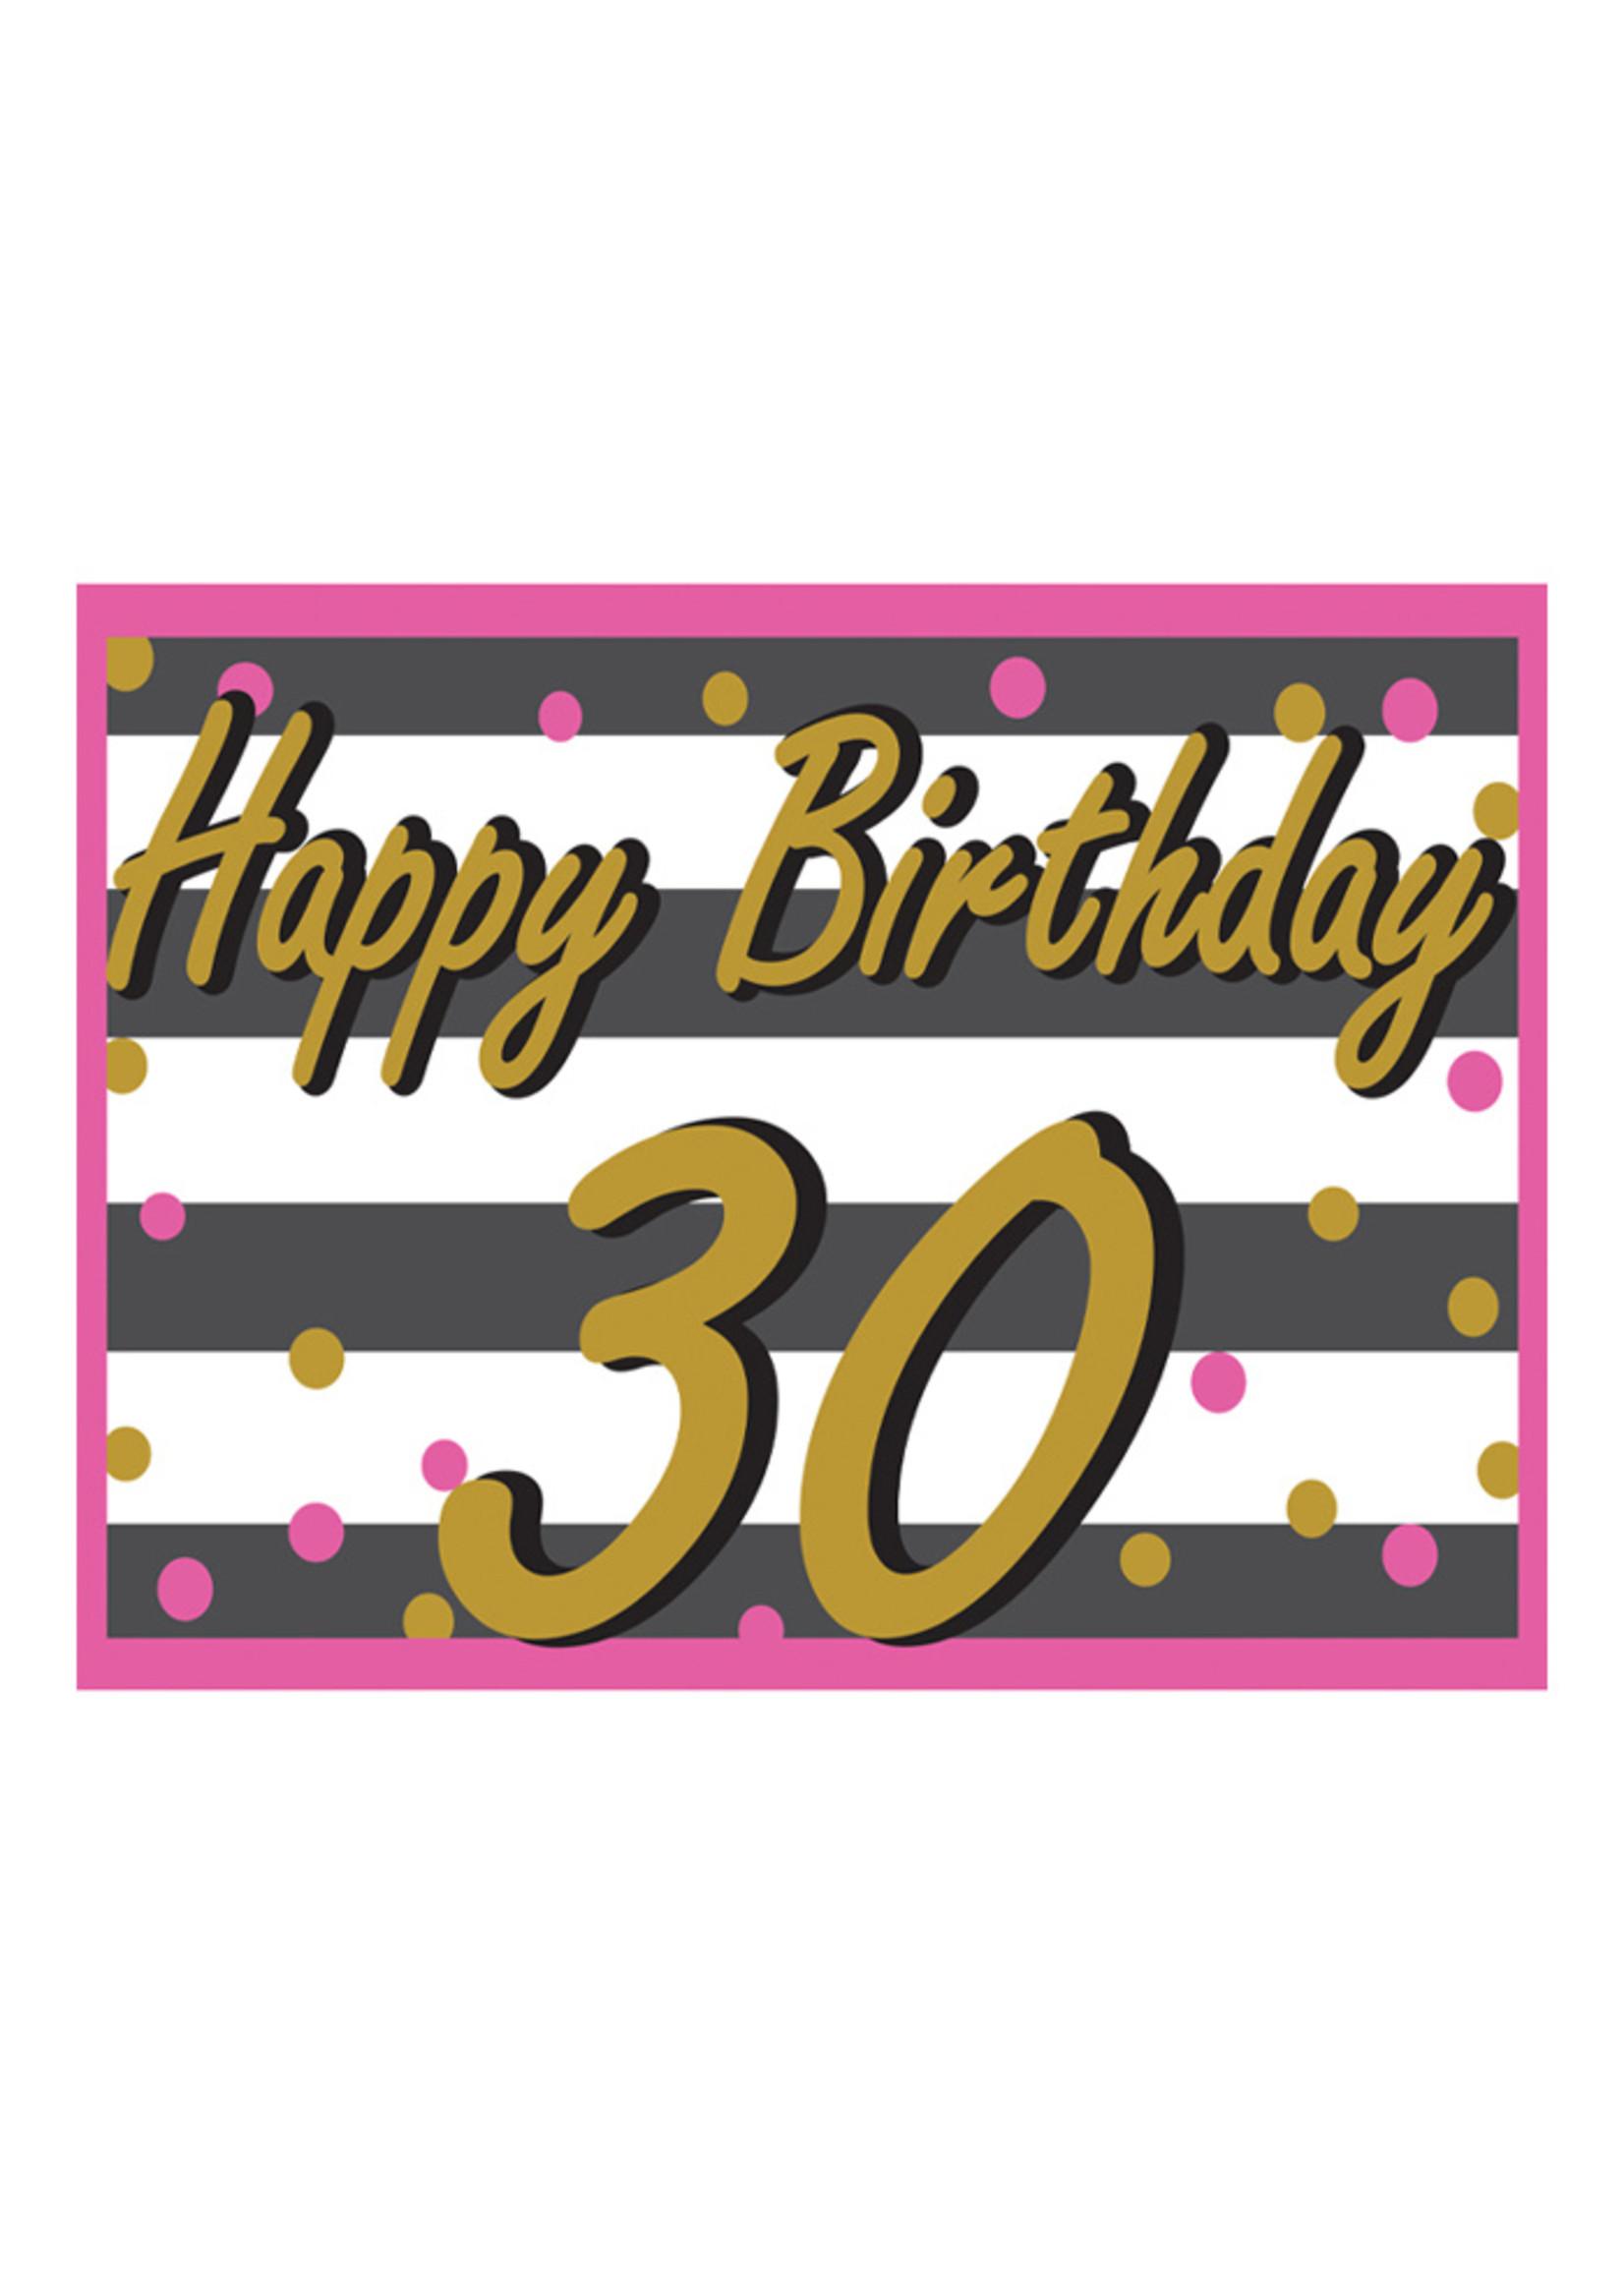 Happy Birthday 30th Pink & Gold Yard Sign